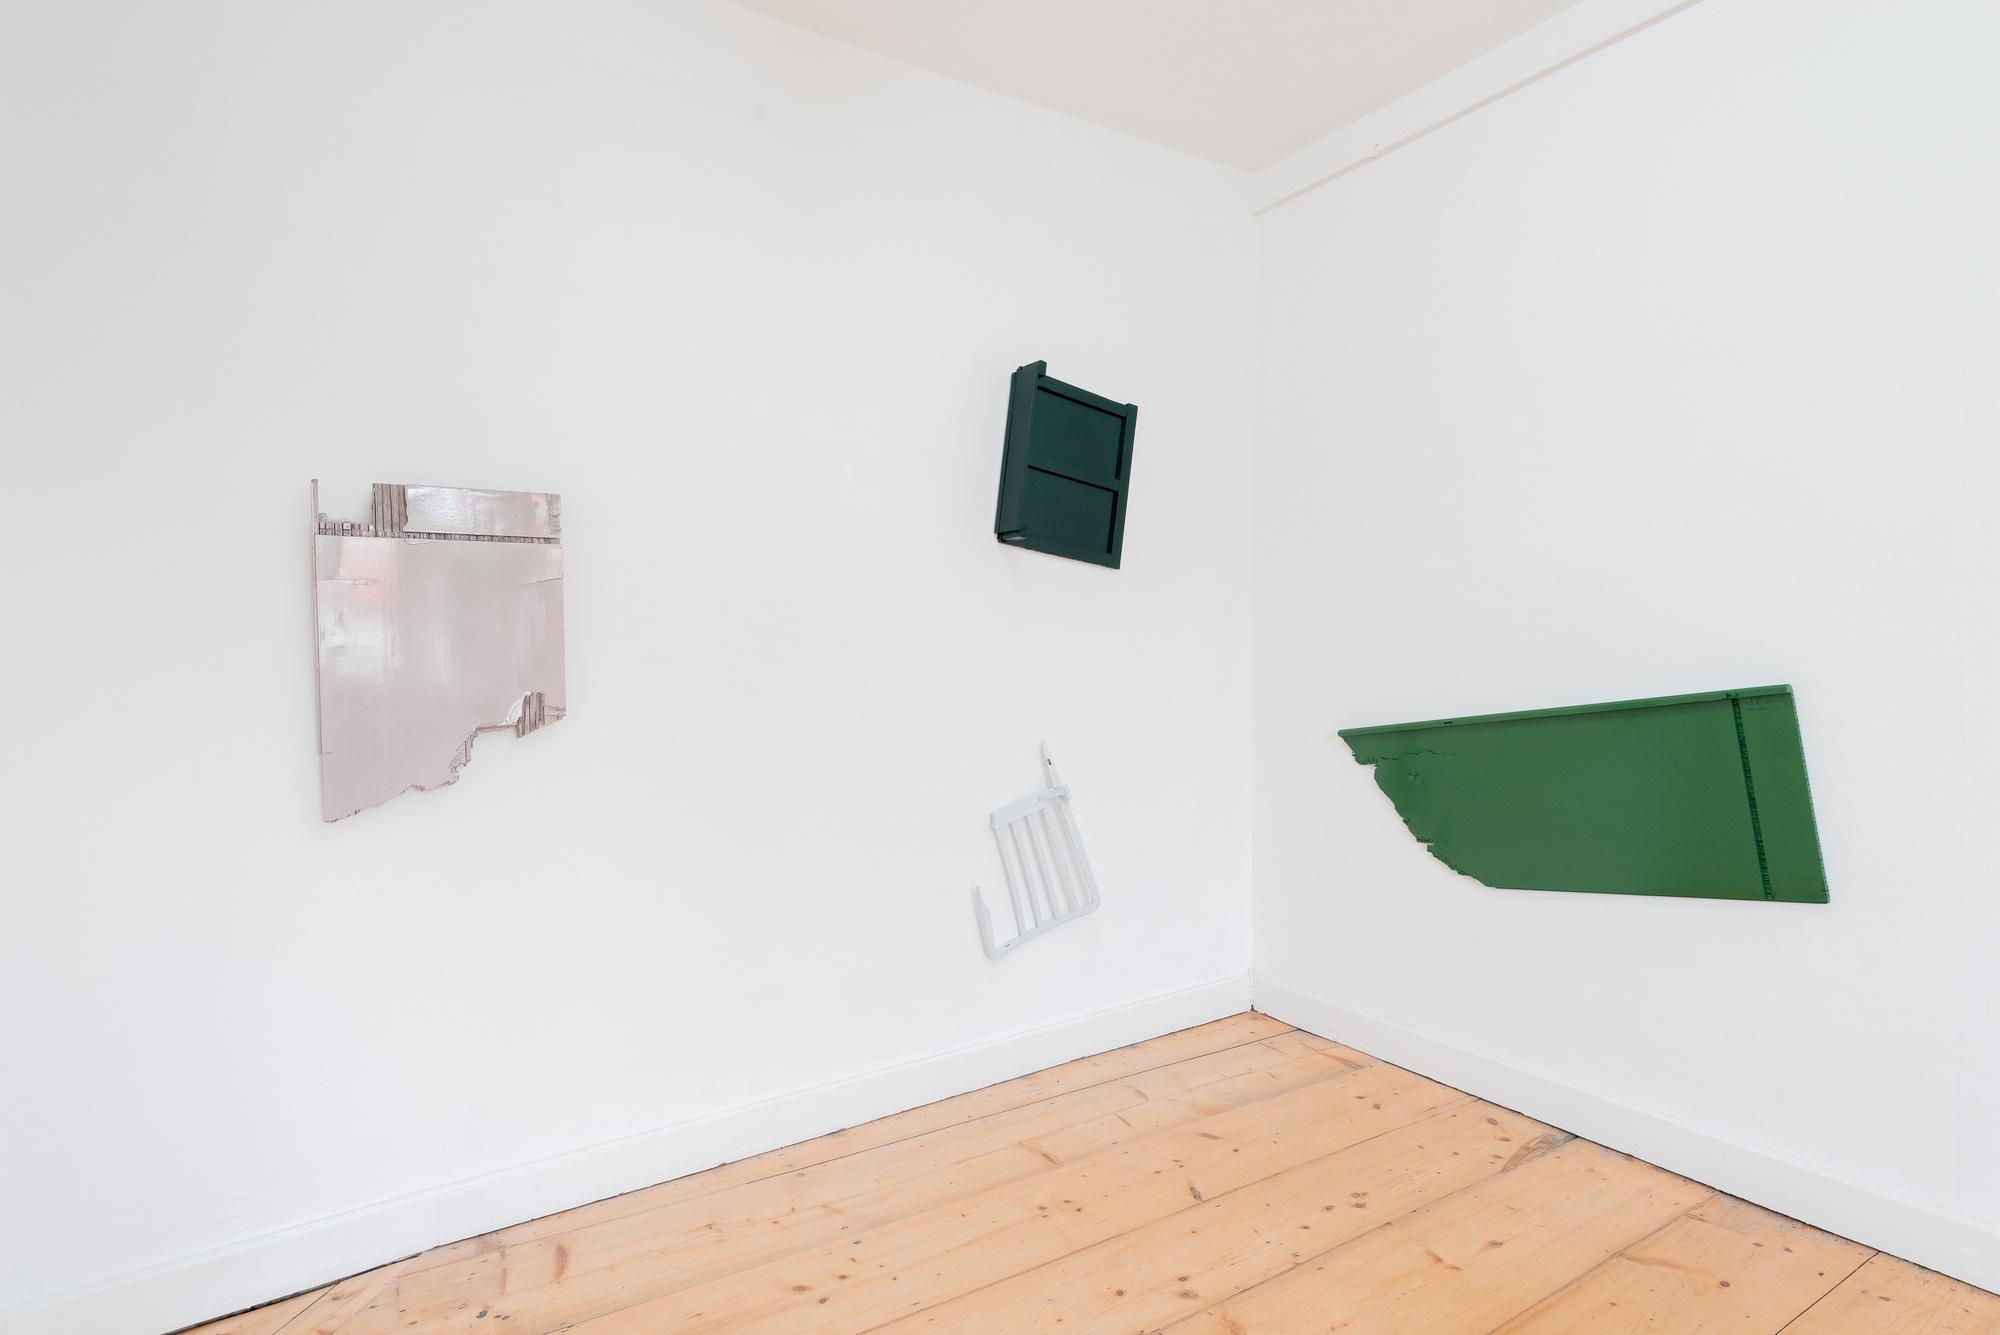 Open House at Kunstverein Braunschweig_Slotawa 1